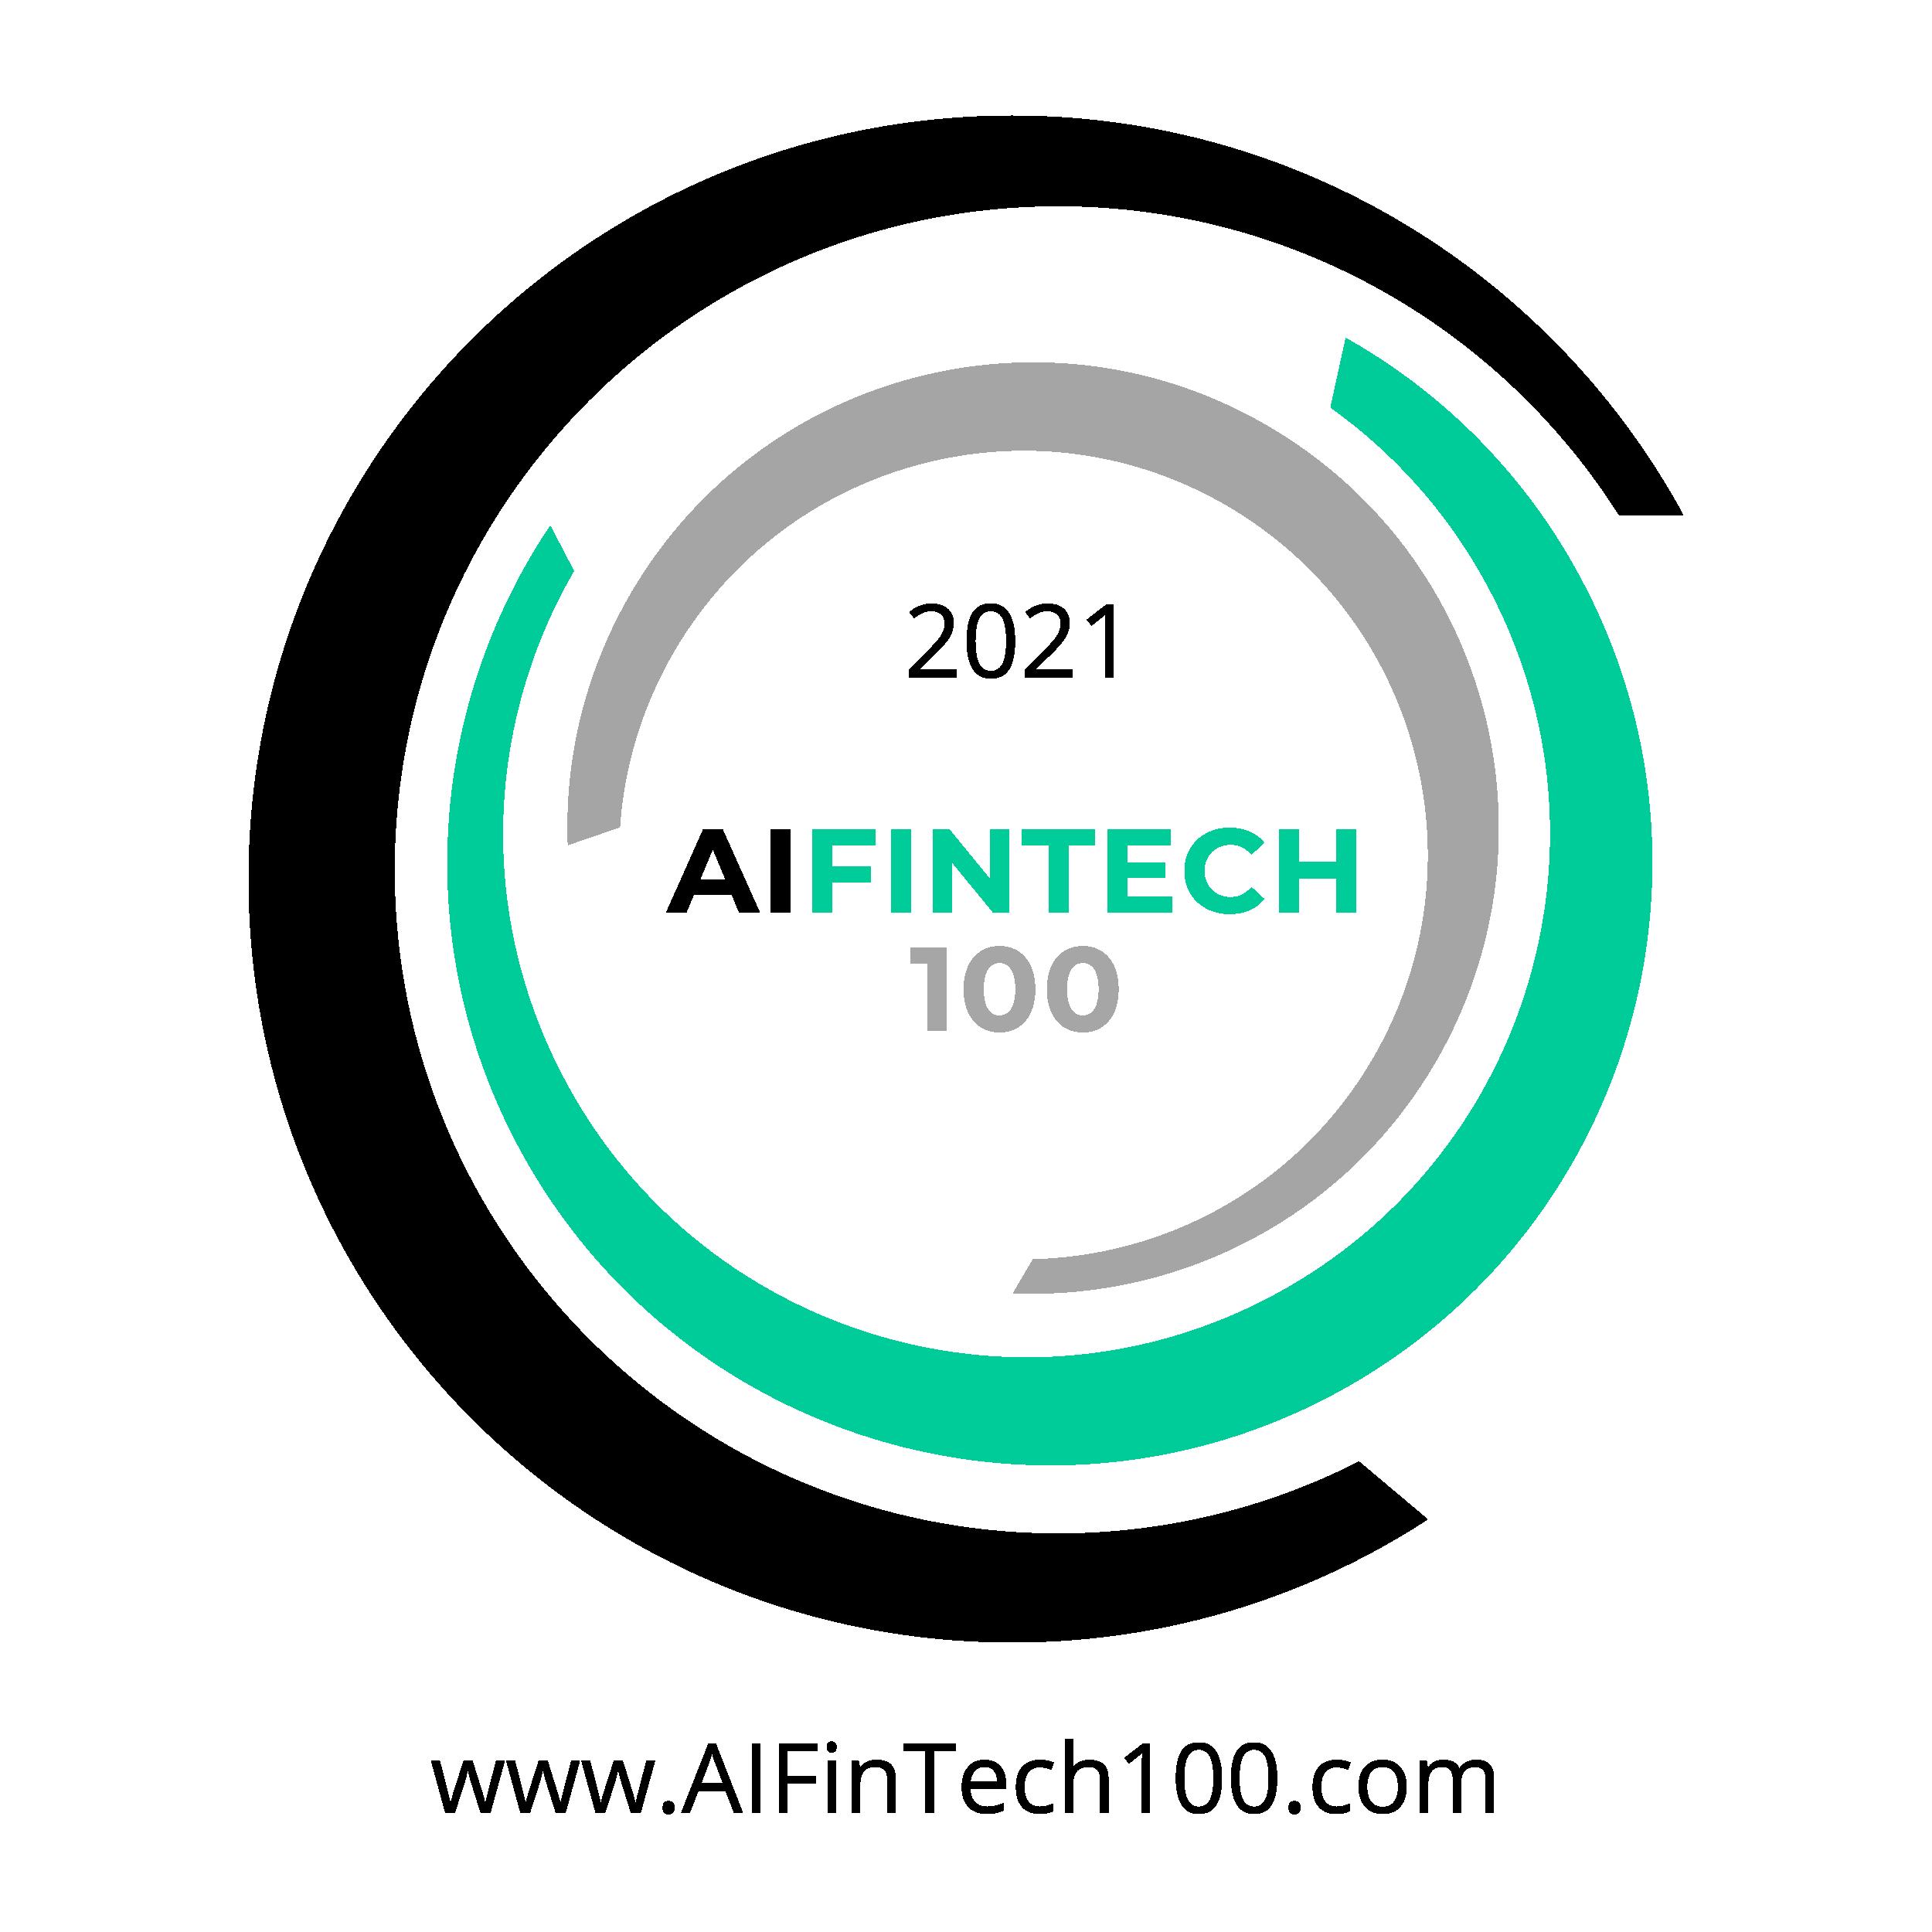 2021 AI FInTech 100 Award